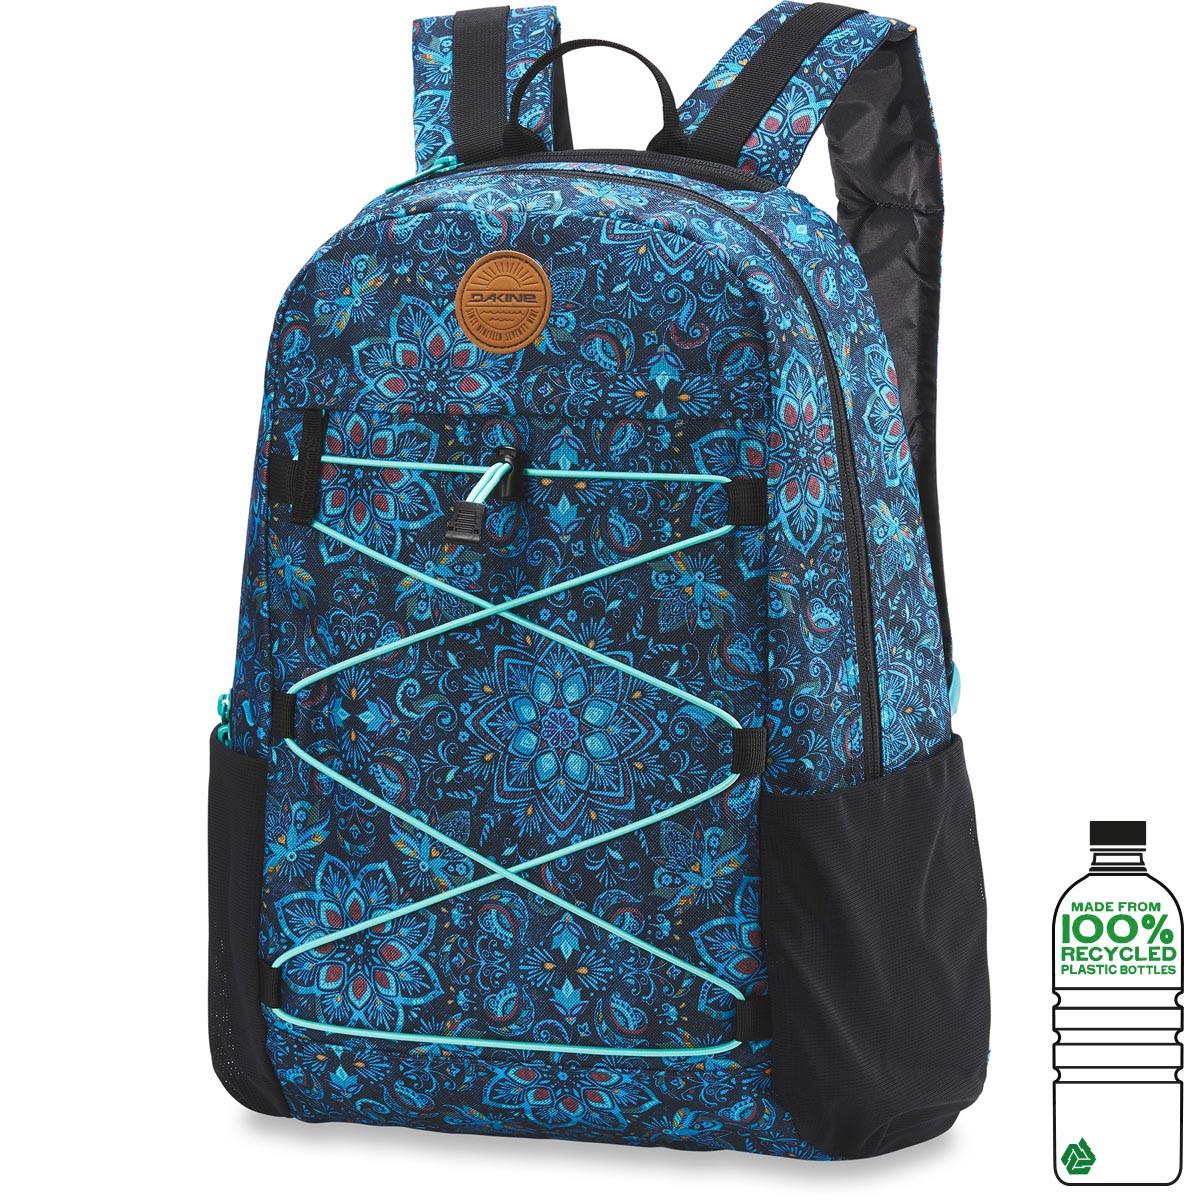 930c578c9df2c Dakine Wonder 22L Backpack Blue Magnolia